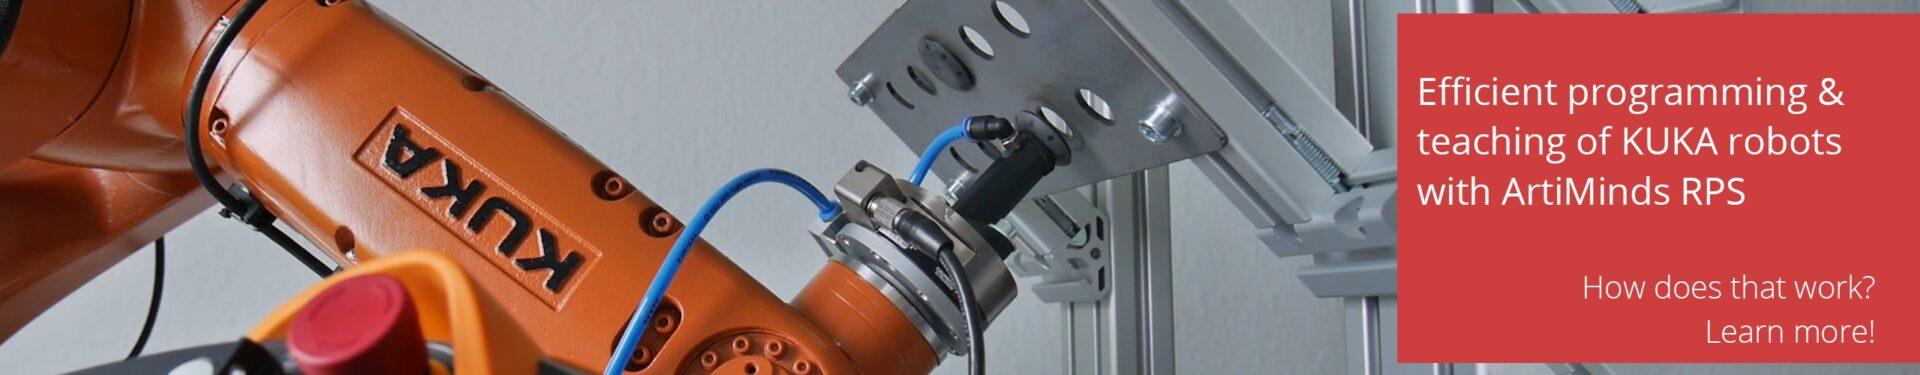 Kuka robot programming and teaching with ArtiMinds